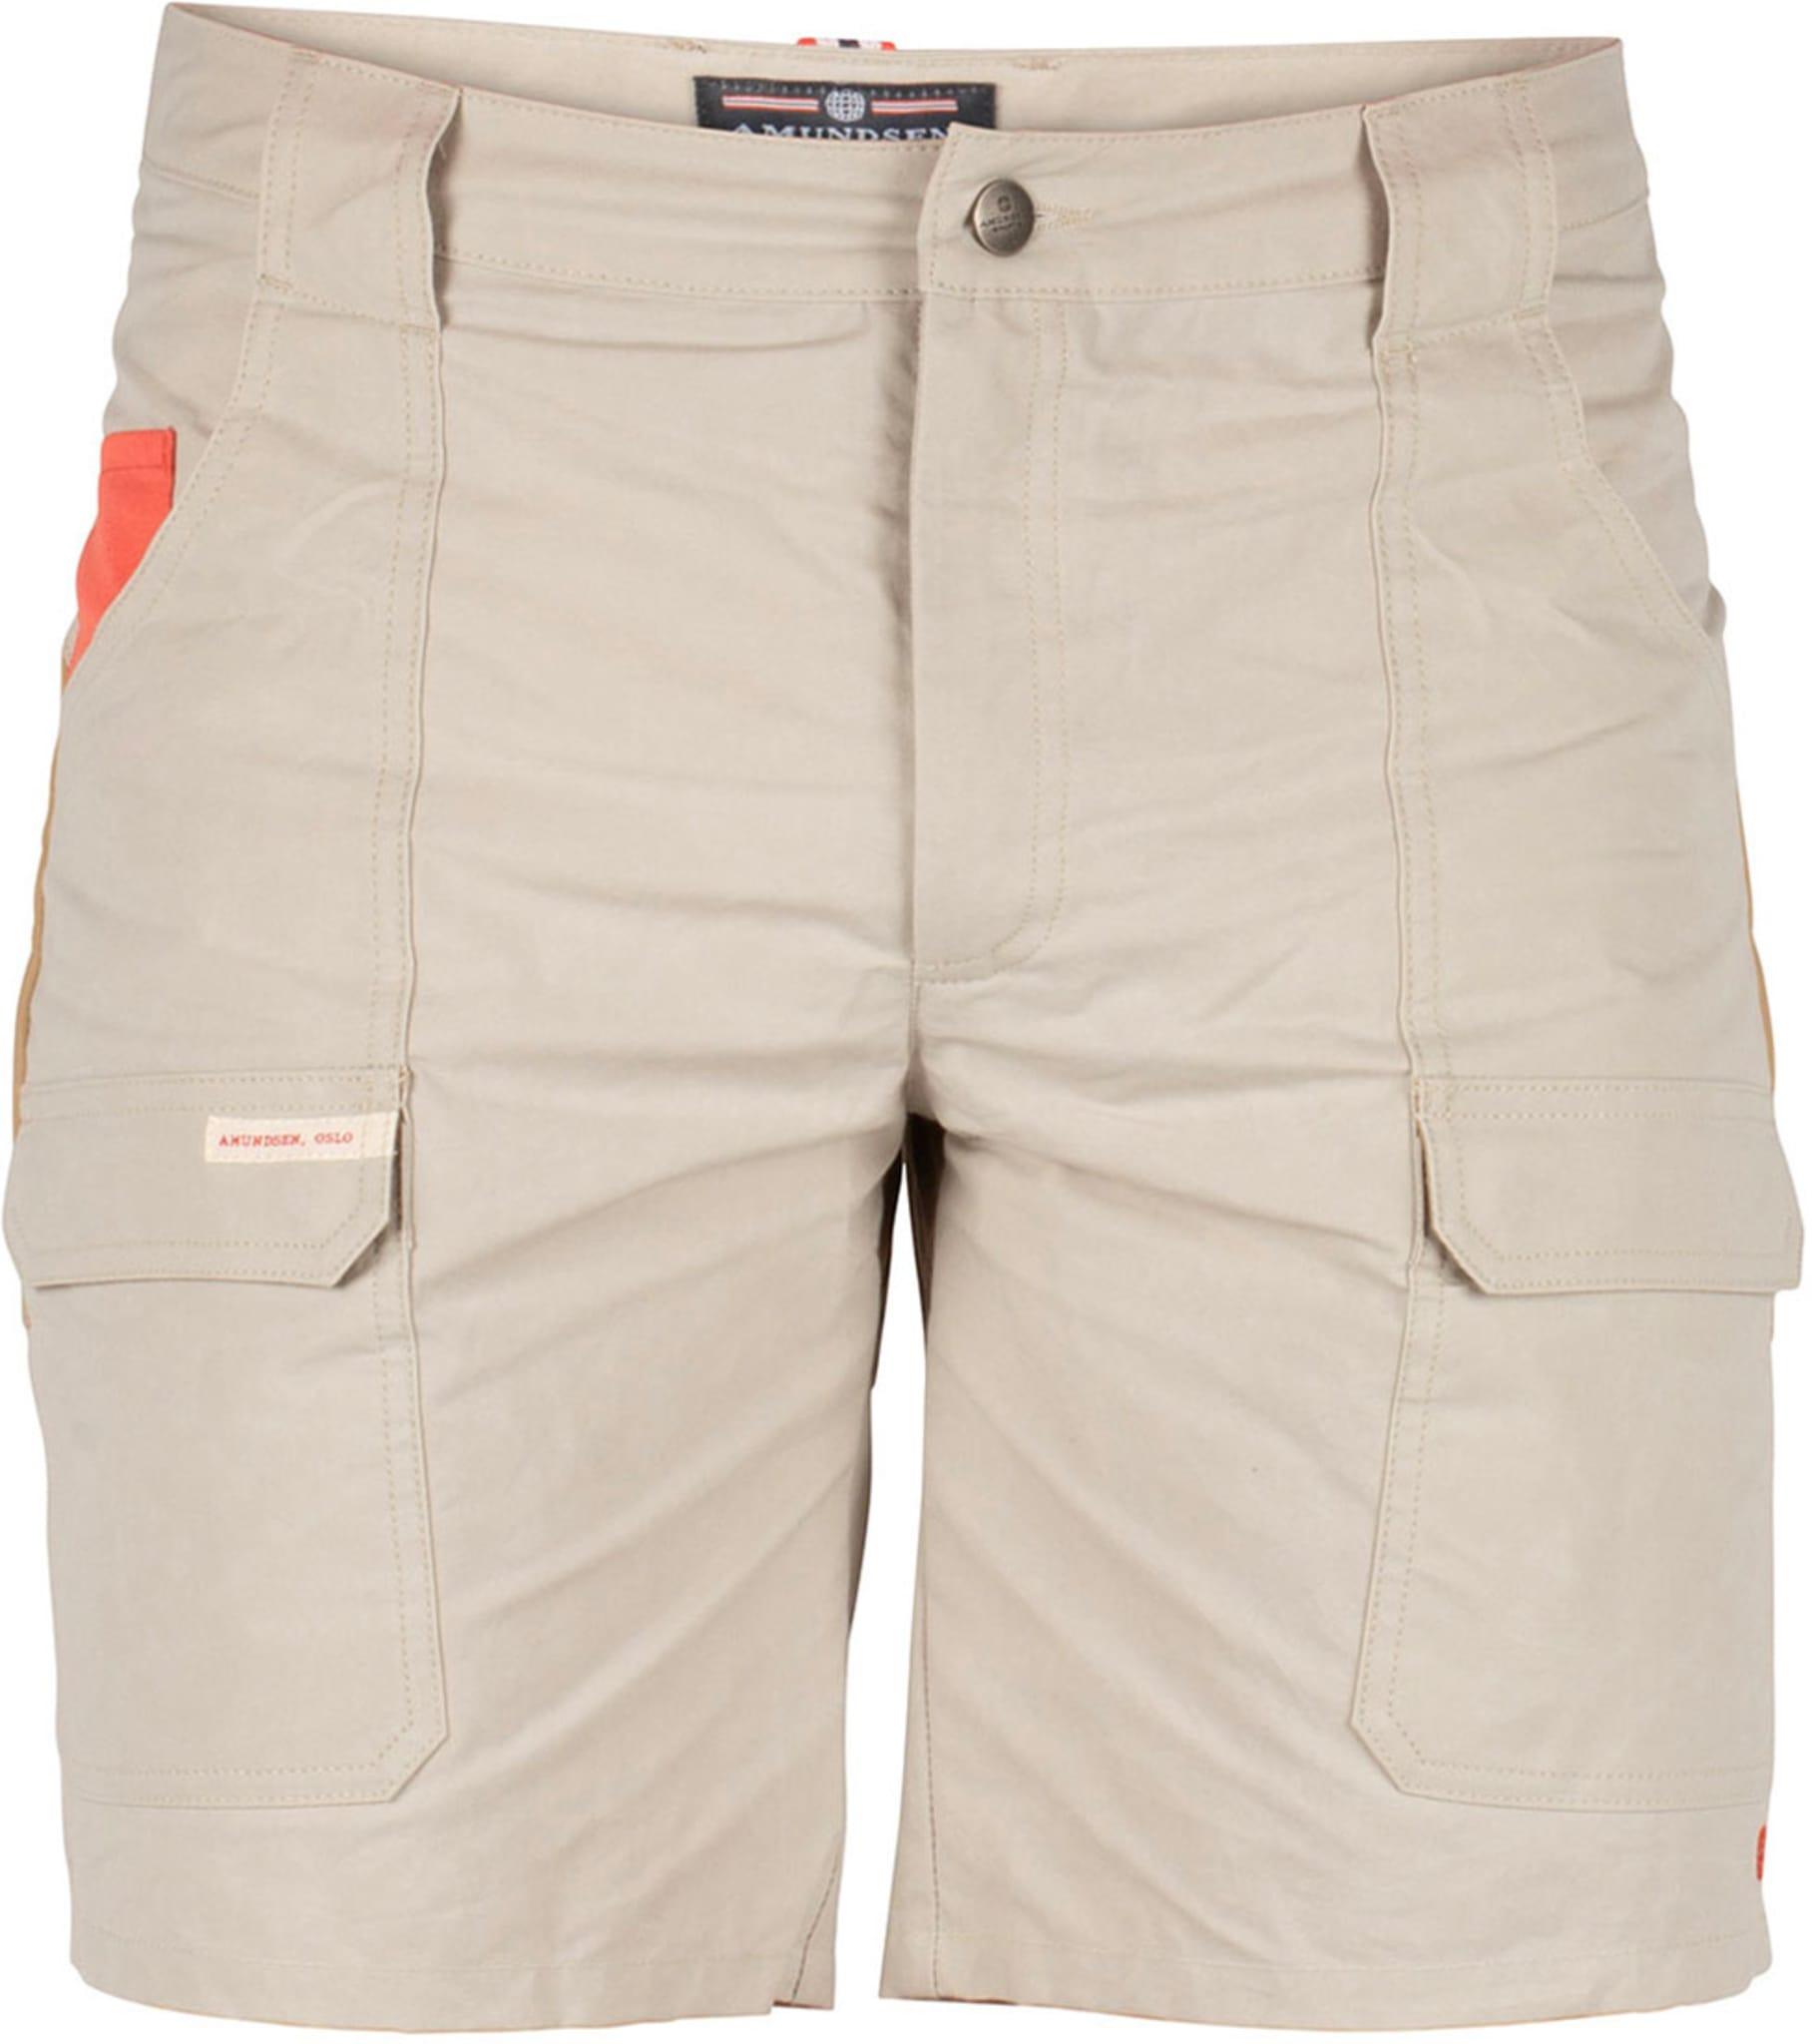 9incher Cargo Shorts M